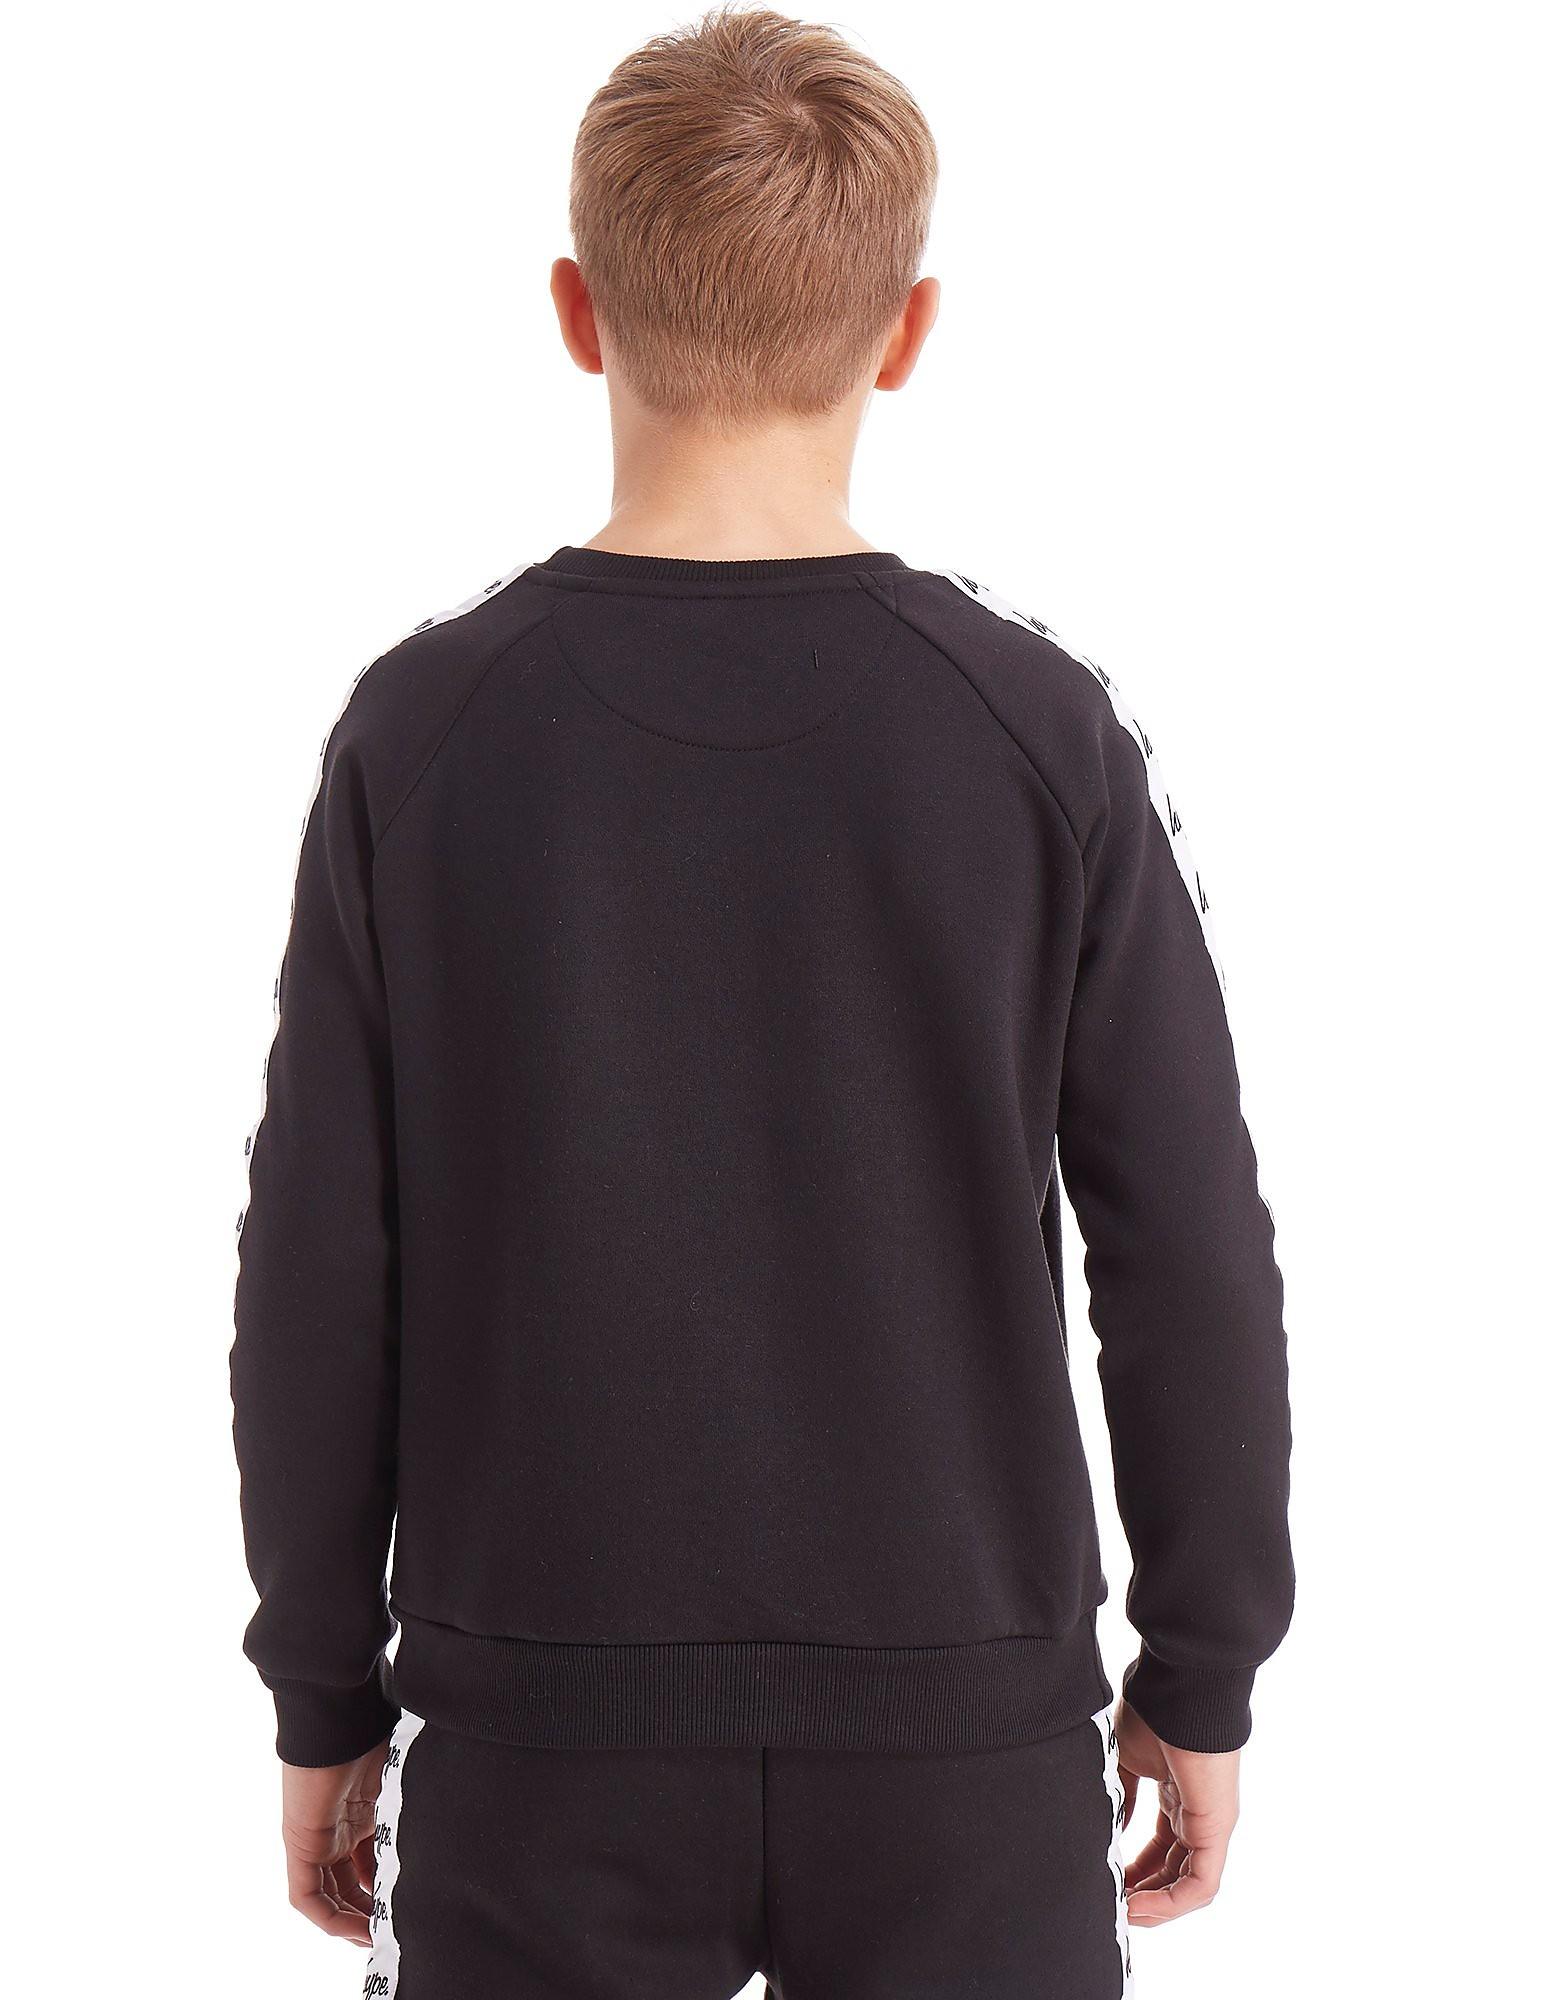 Hype Tape Crew Sweatshirt Junior